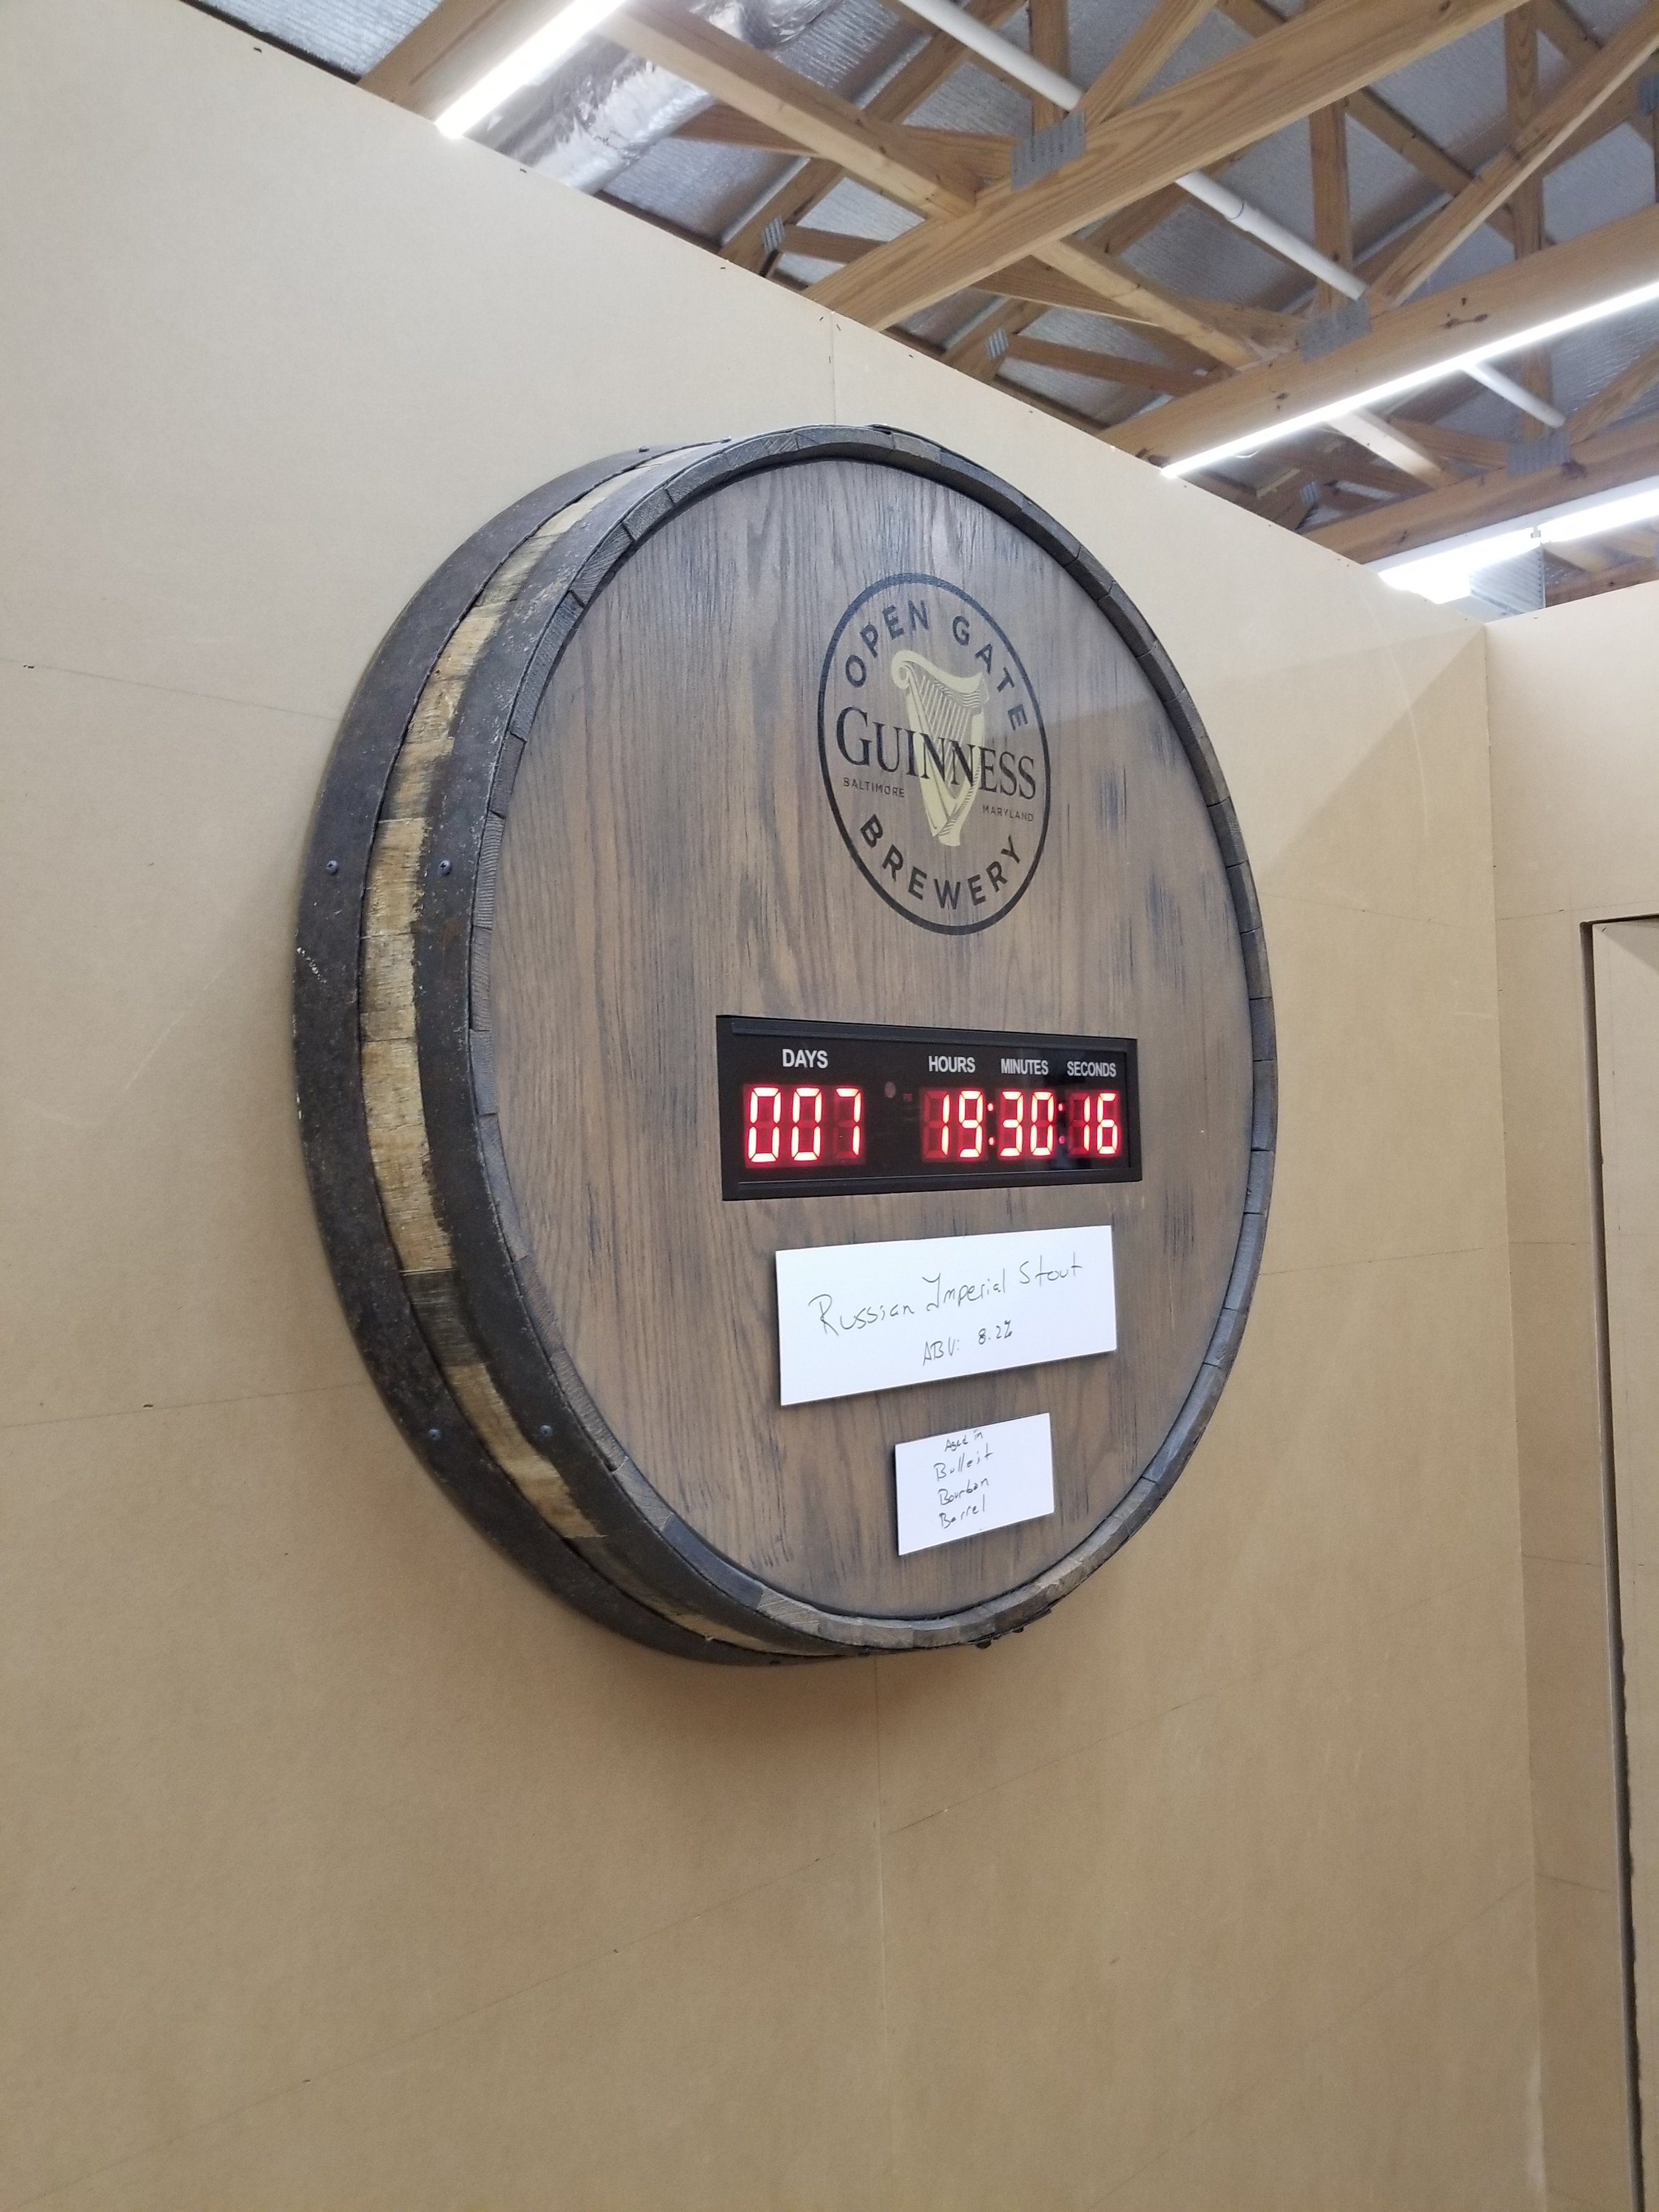 Guinness Brewery Countdown Clock.jpg